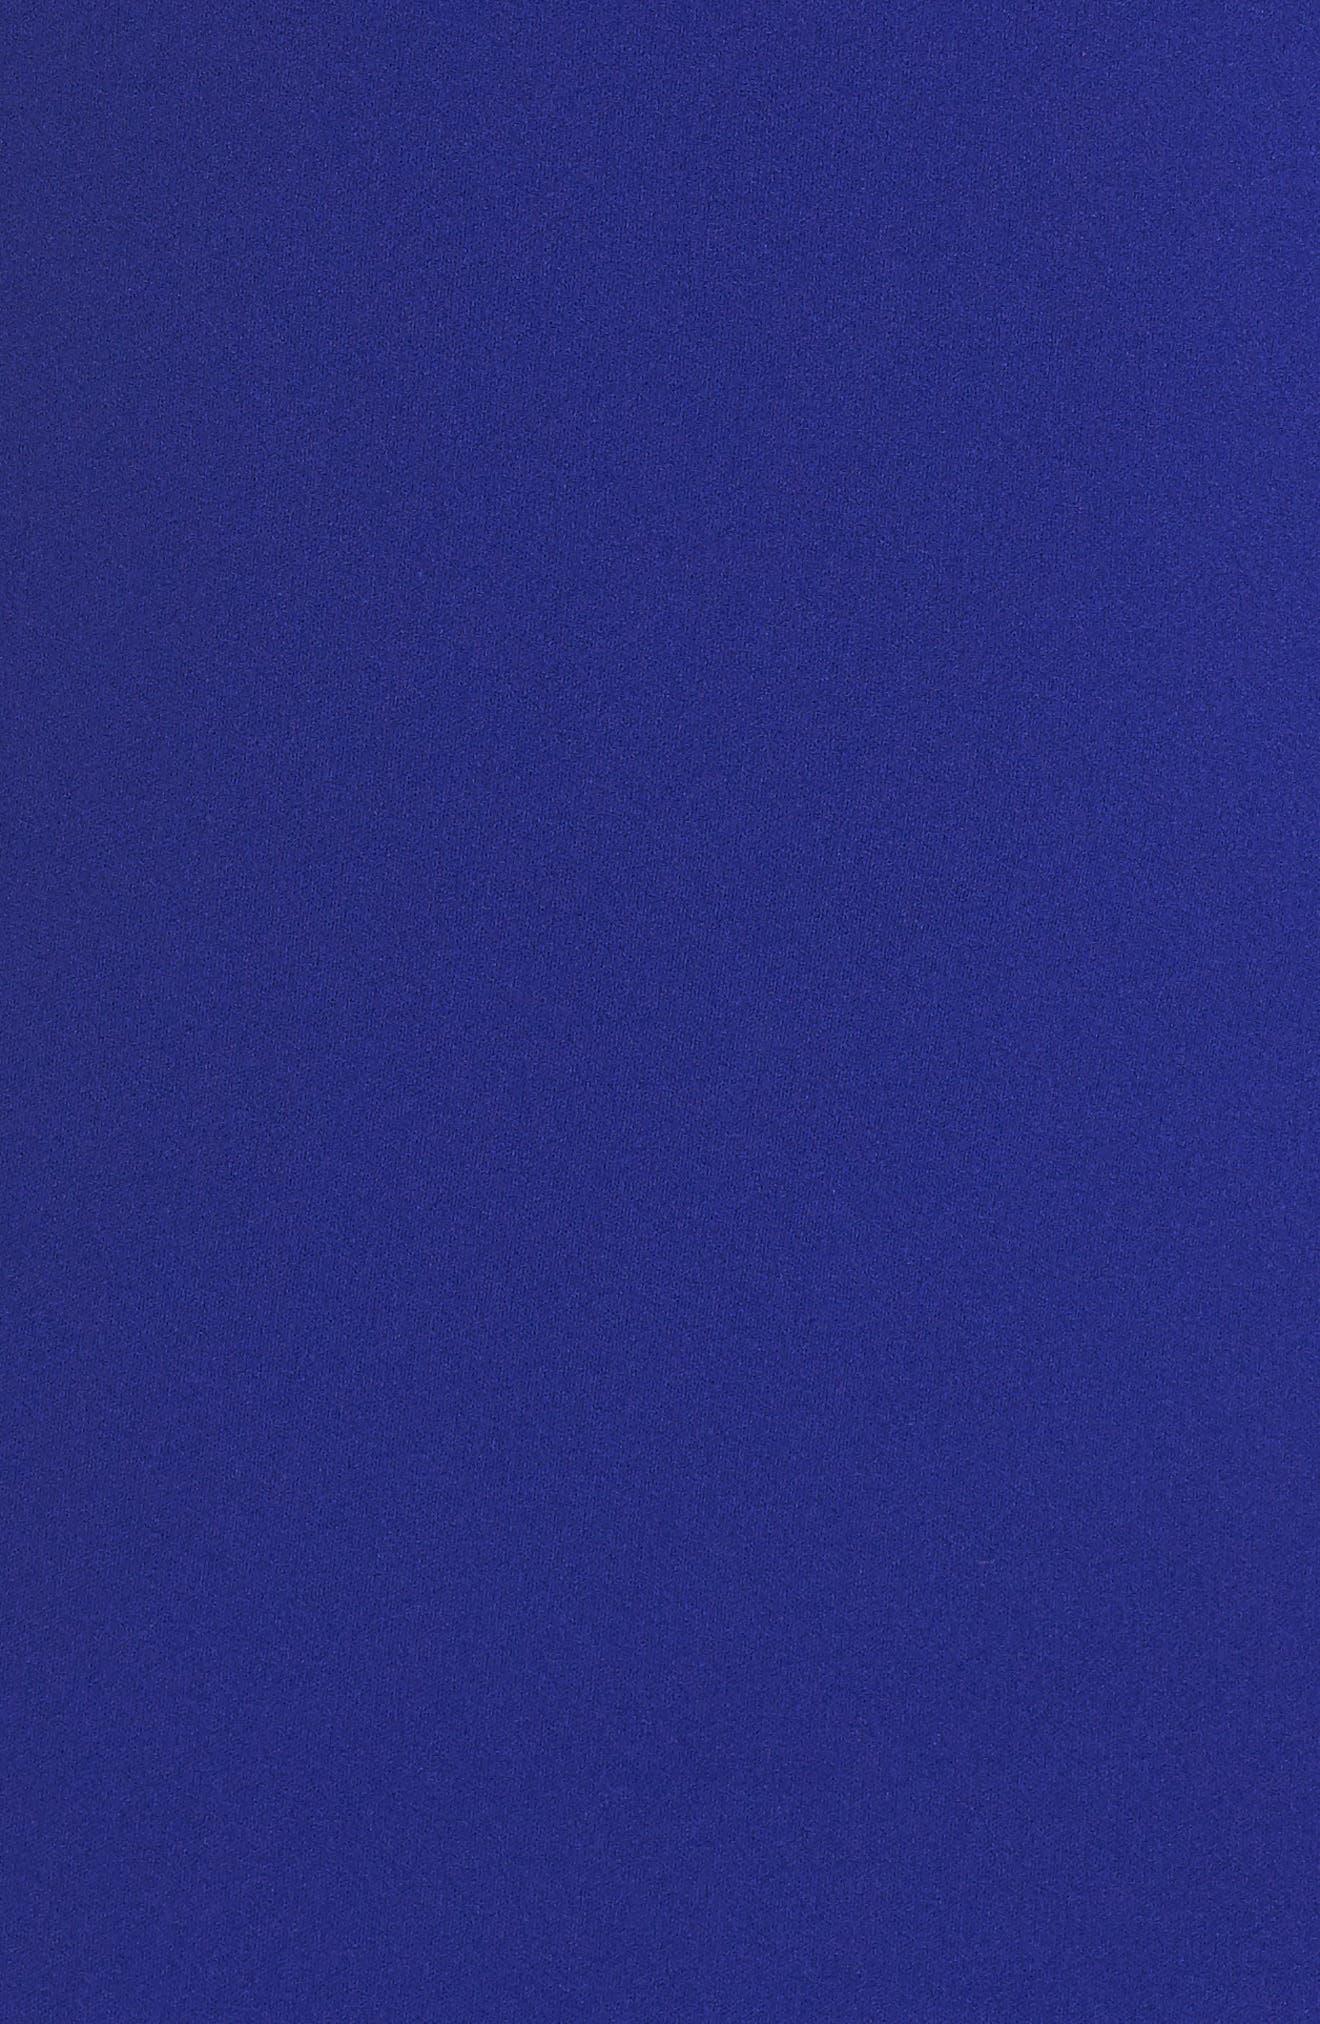 Ruffle Hem Scuba Crepe Body-Con Dress,                             Alternate thumbnail 6, color,                             430